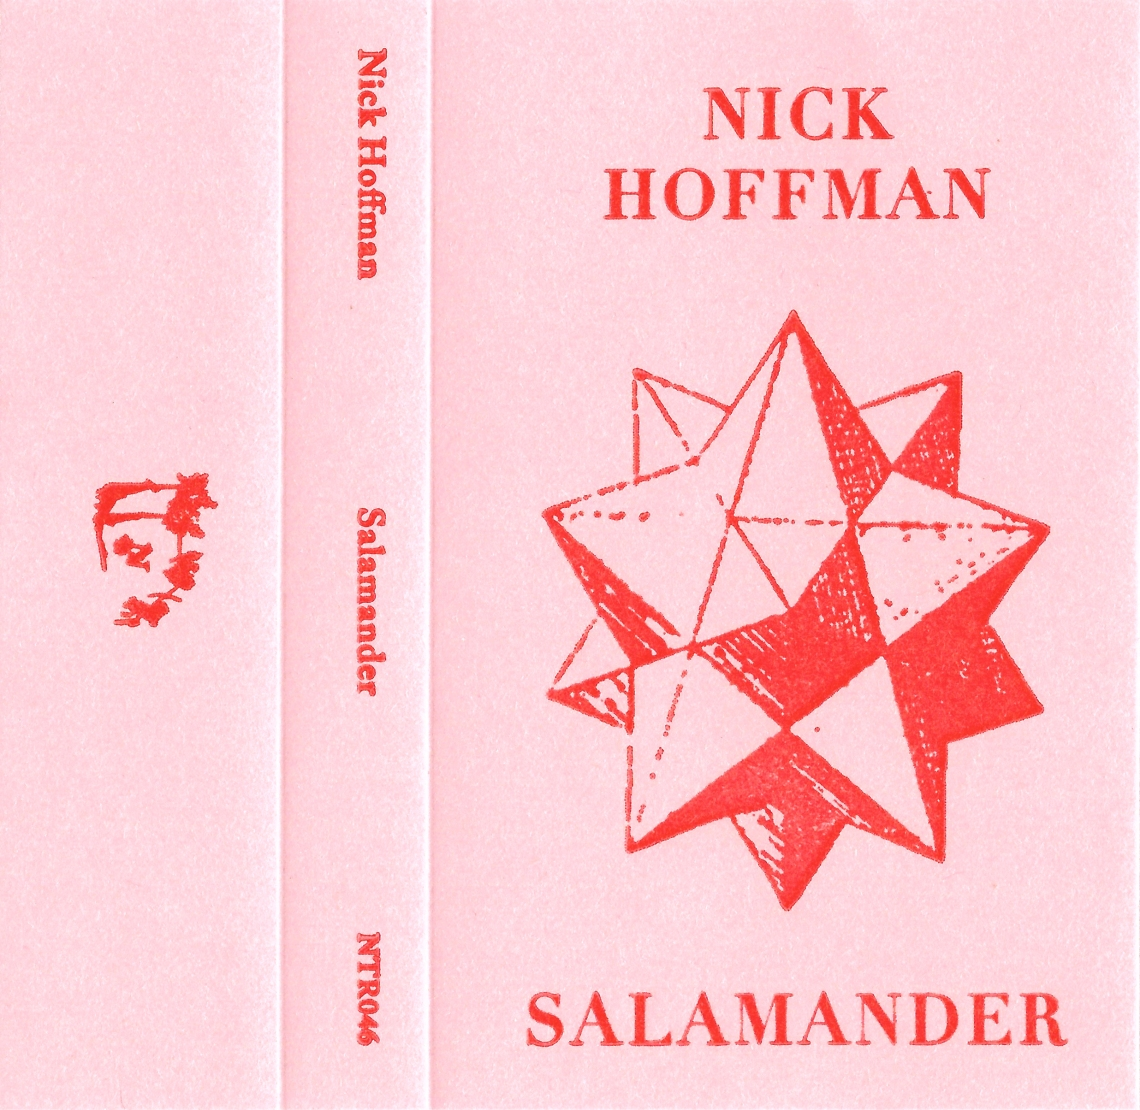 NickHoffman_Salamander